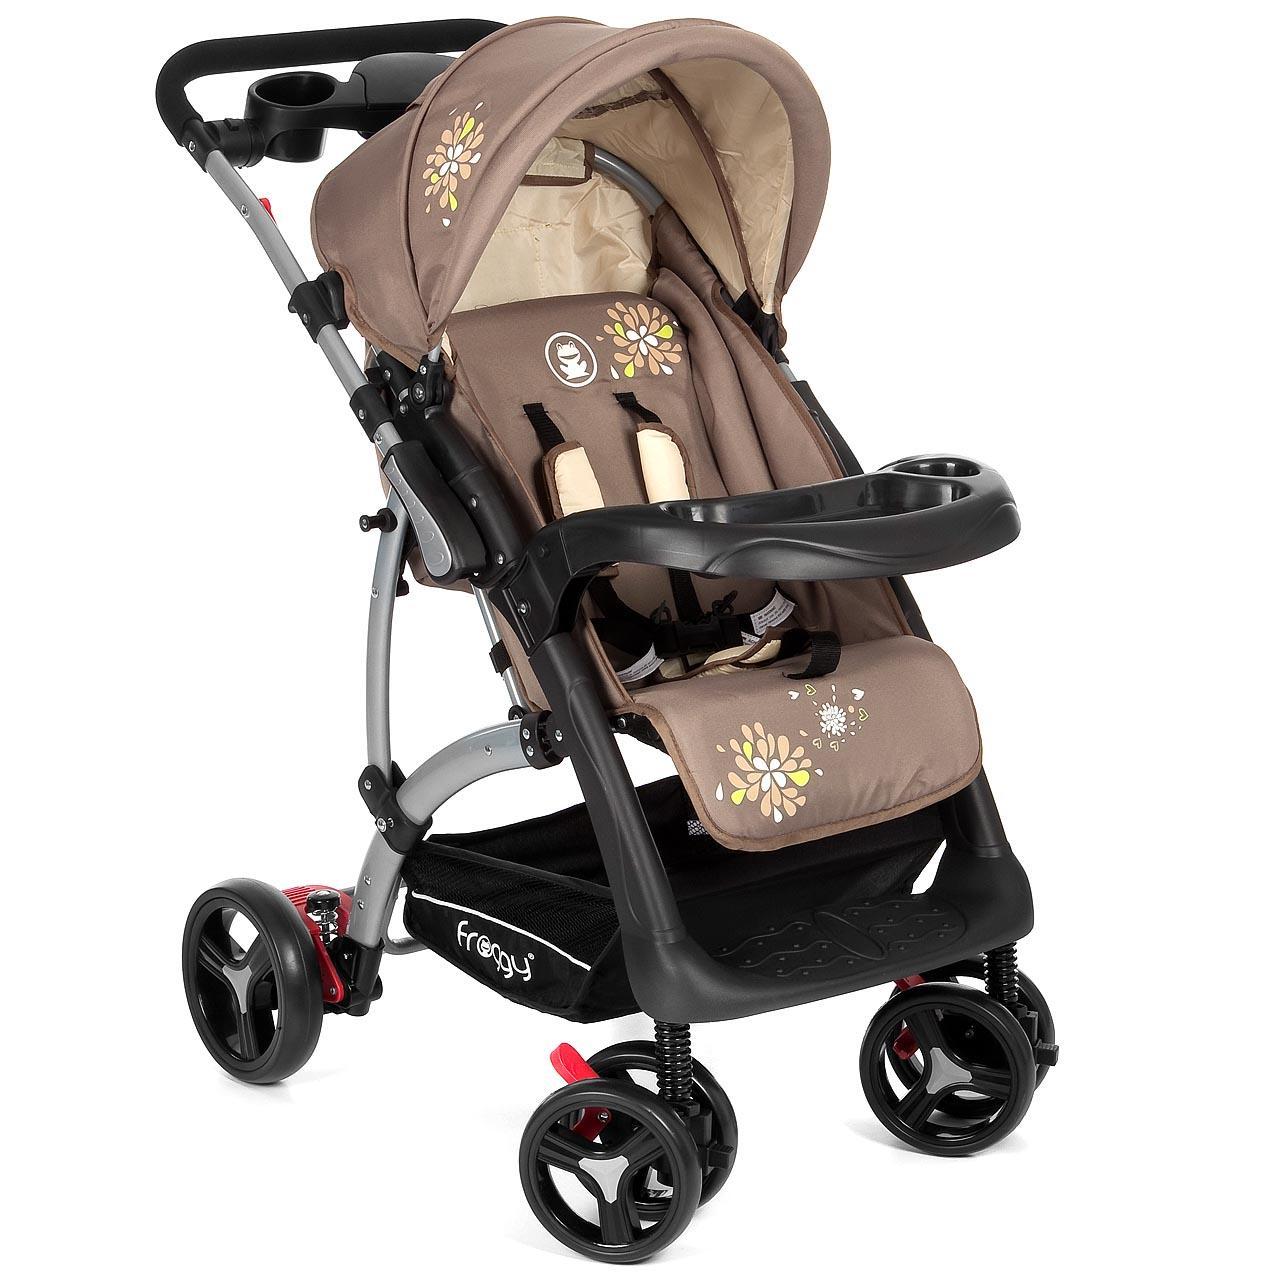 kinderwagen ranger s4 buggy jogger sportwagen babywagen sportbuggy kinderbuggy ebay. Black Bedroom Furniture Sets. Home Design Ideas